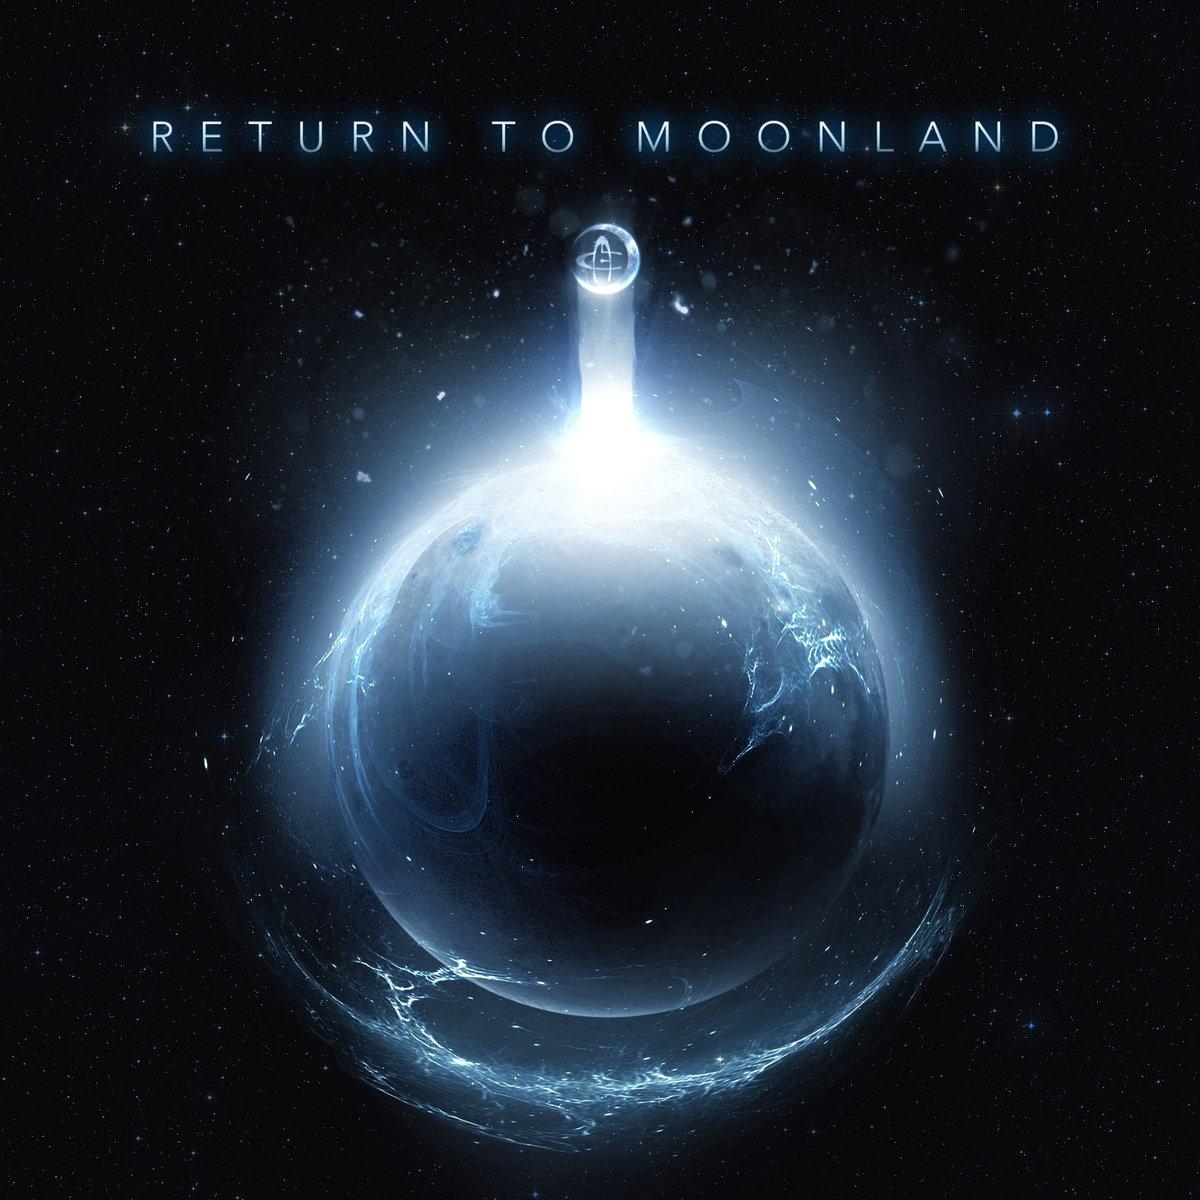 Return to Moonland | Au5